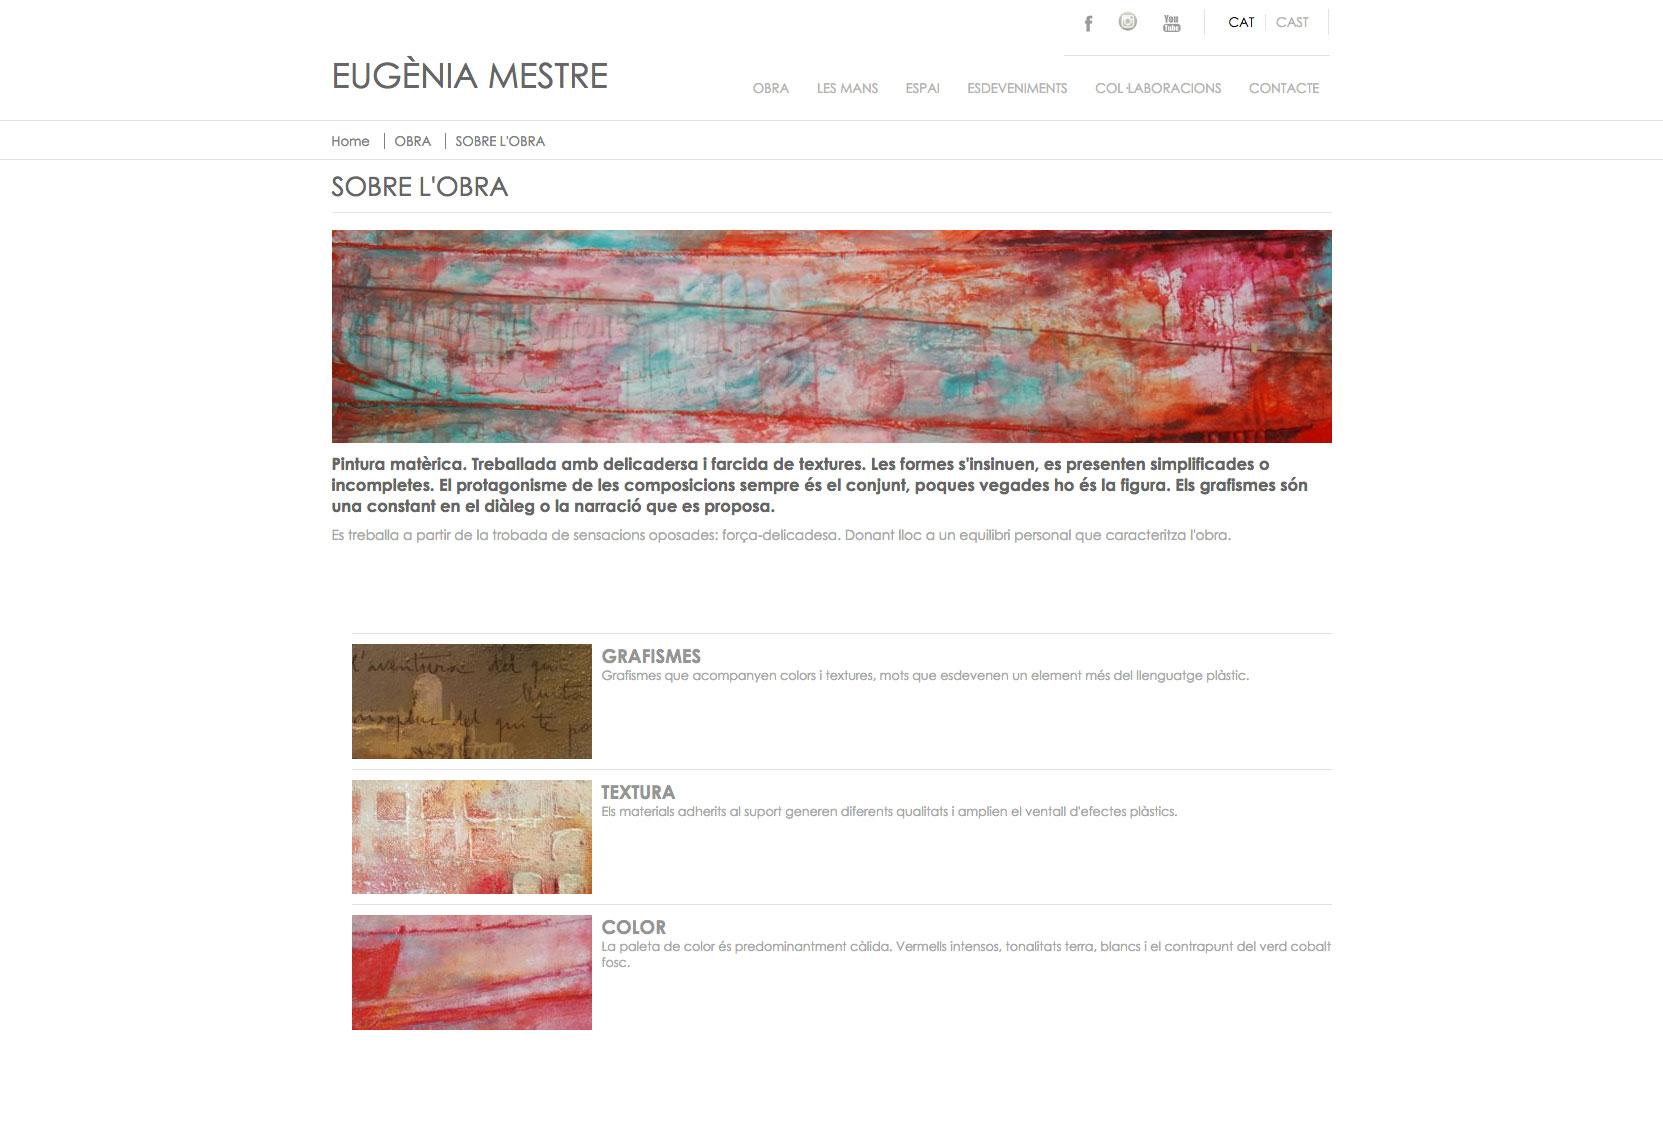 Diseño web para Eugenia Mestre